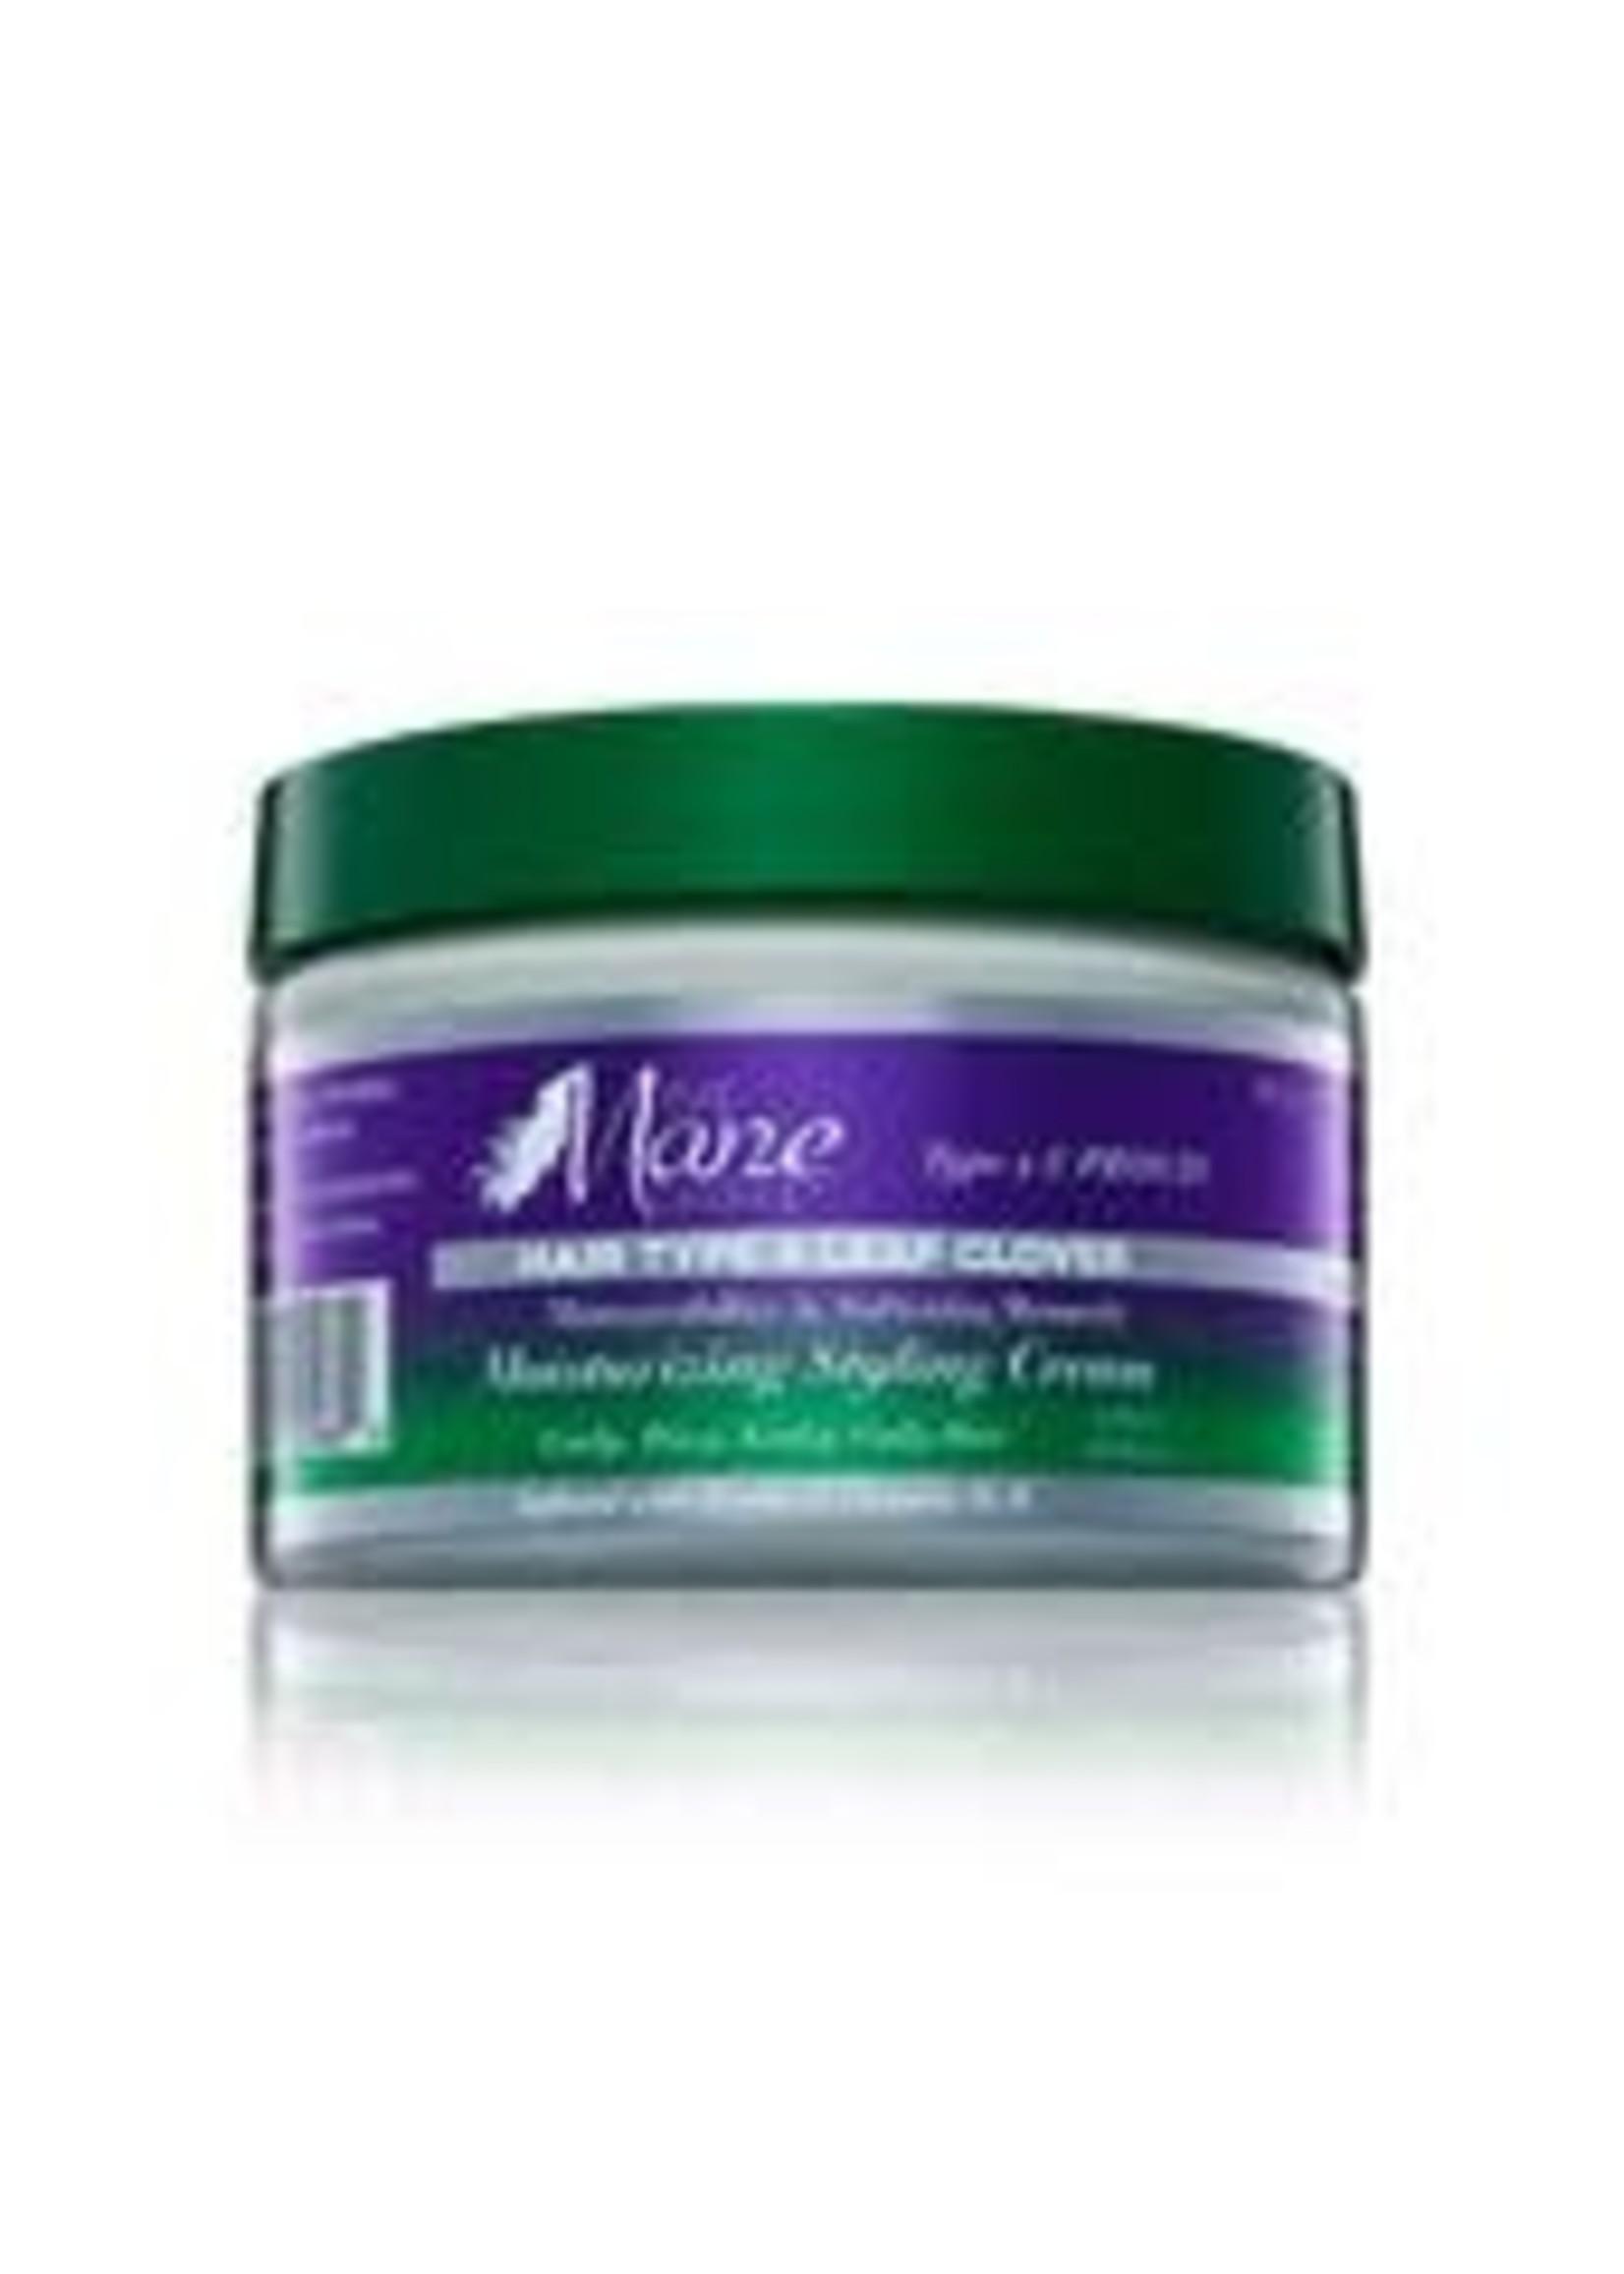 Mane Choice Hair type 4 Leaf Clover Styling Cream